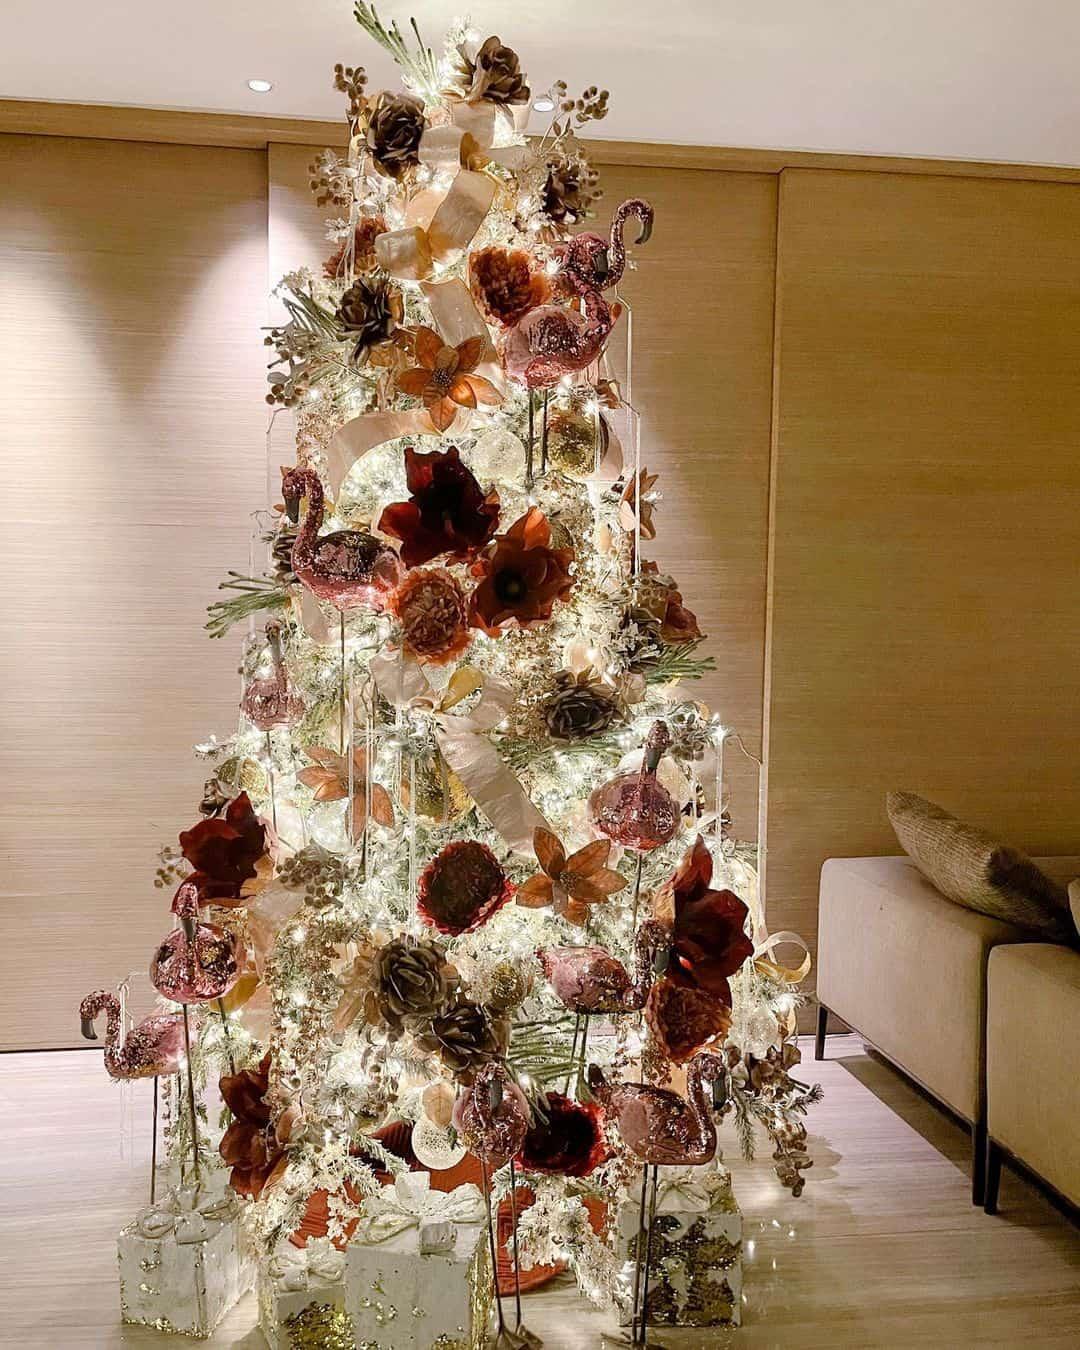 Jinkee Pacquiao's 2020 Christmas tree